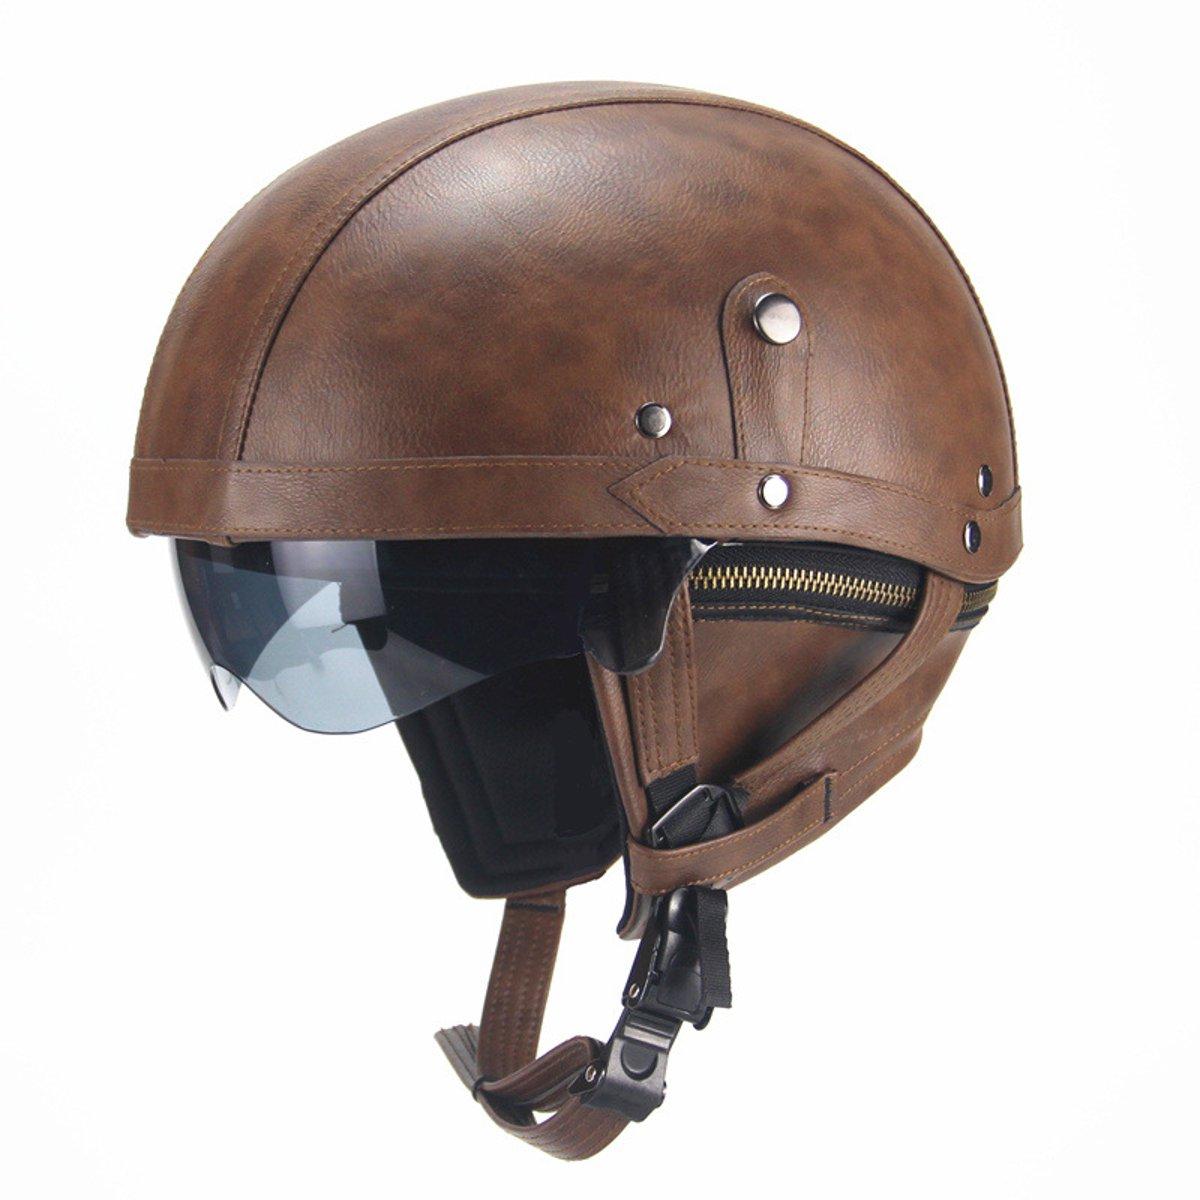 Retro-PU-Leather-Motorcycle-Open-Face-Half-Helmet-amp-Visor-Motorbike-Scooter-Safe